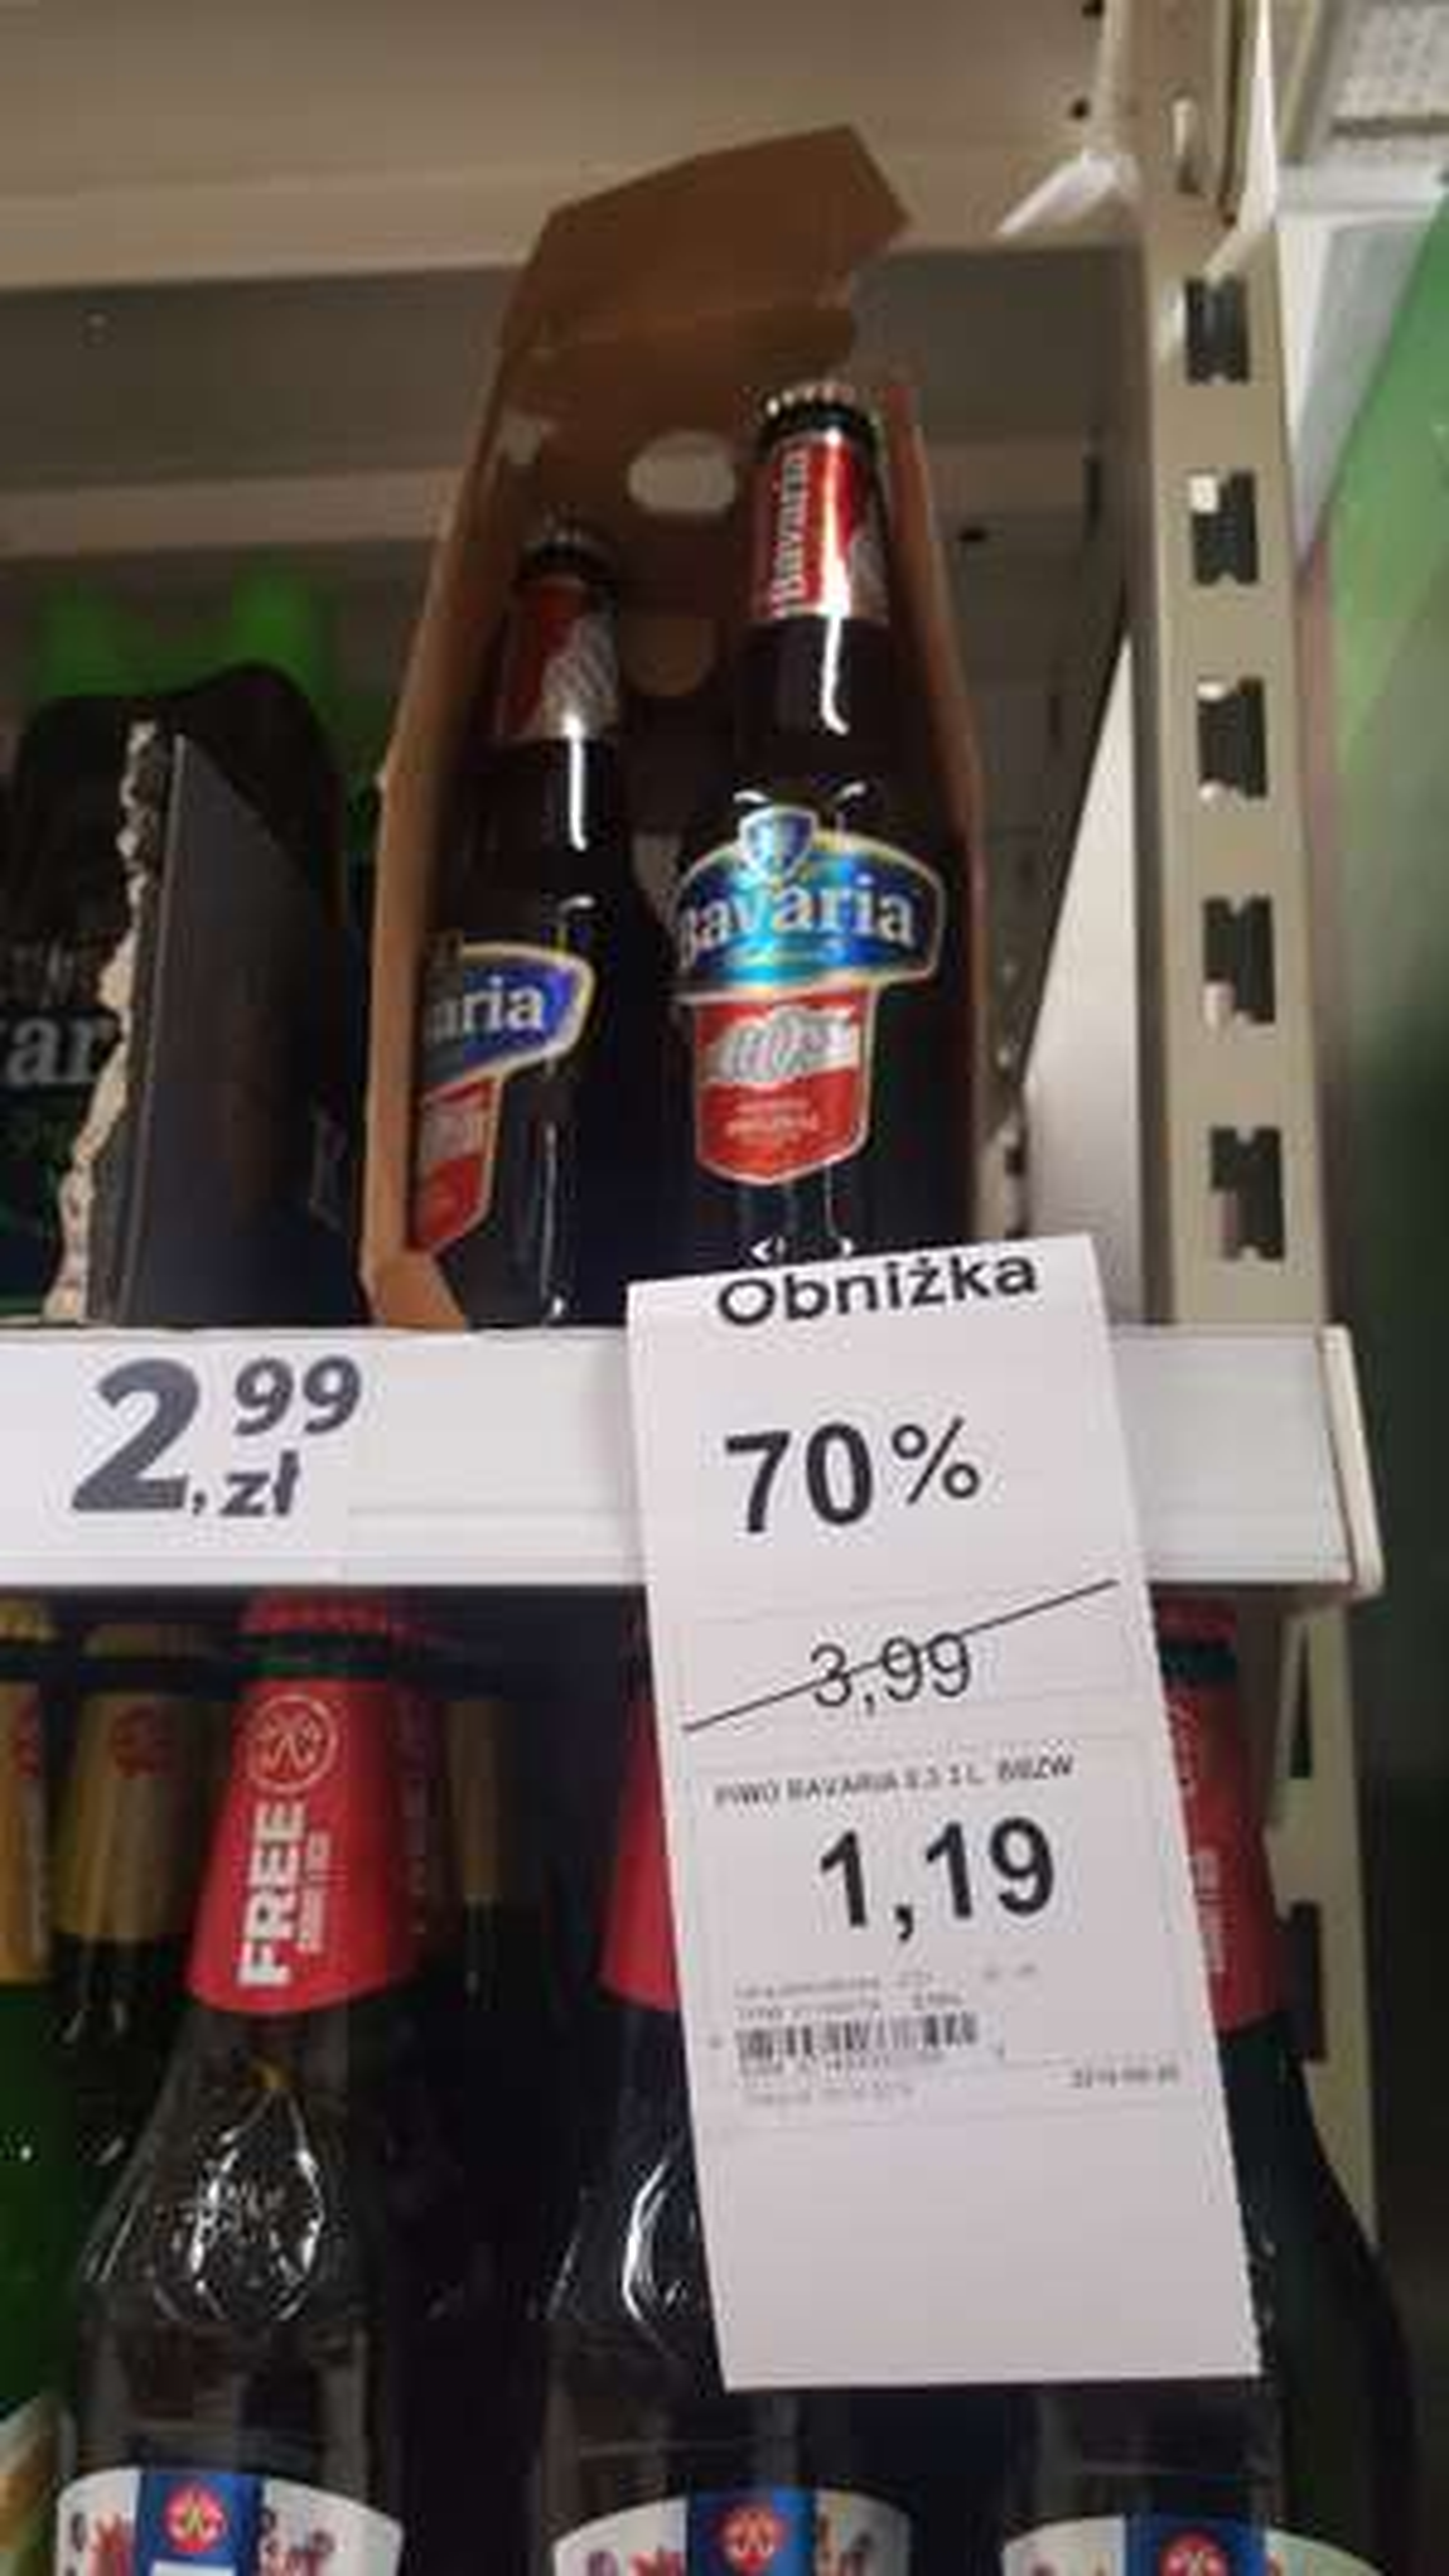 Piwo Bavaria 0% Premium original -70% w TESCO Warszawa Kabaty